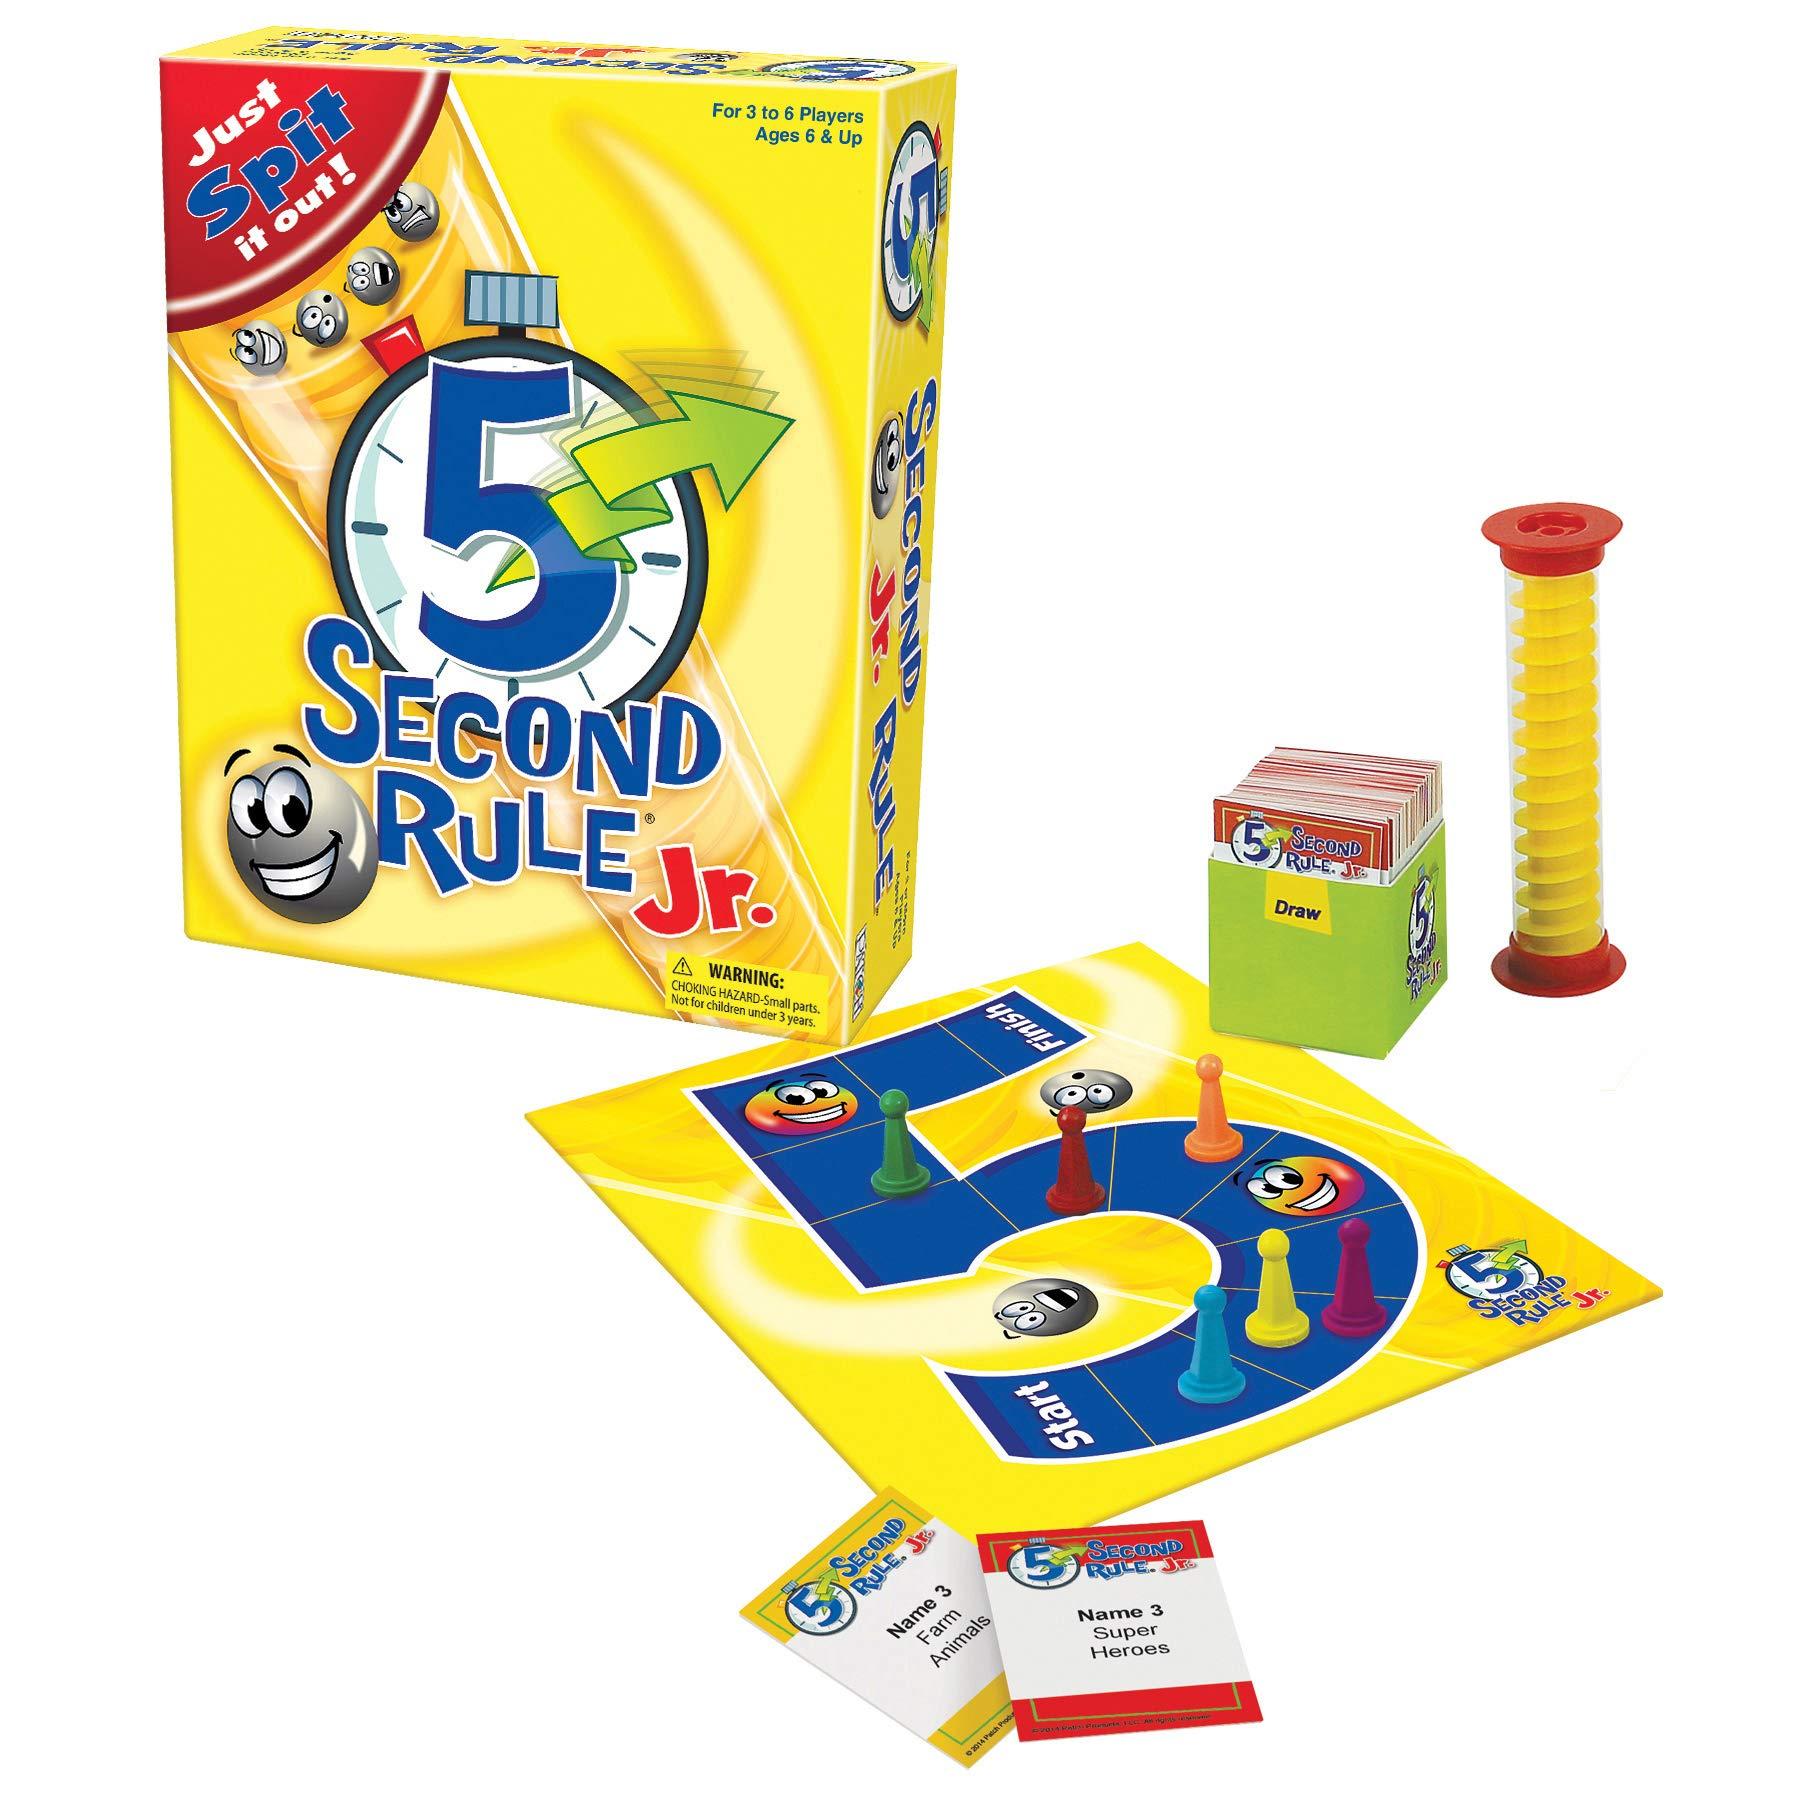 PlayMonster 7424 Second Rule Junior